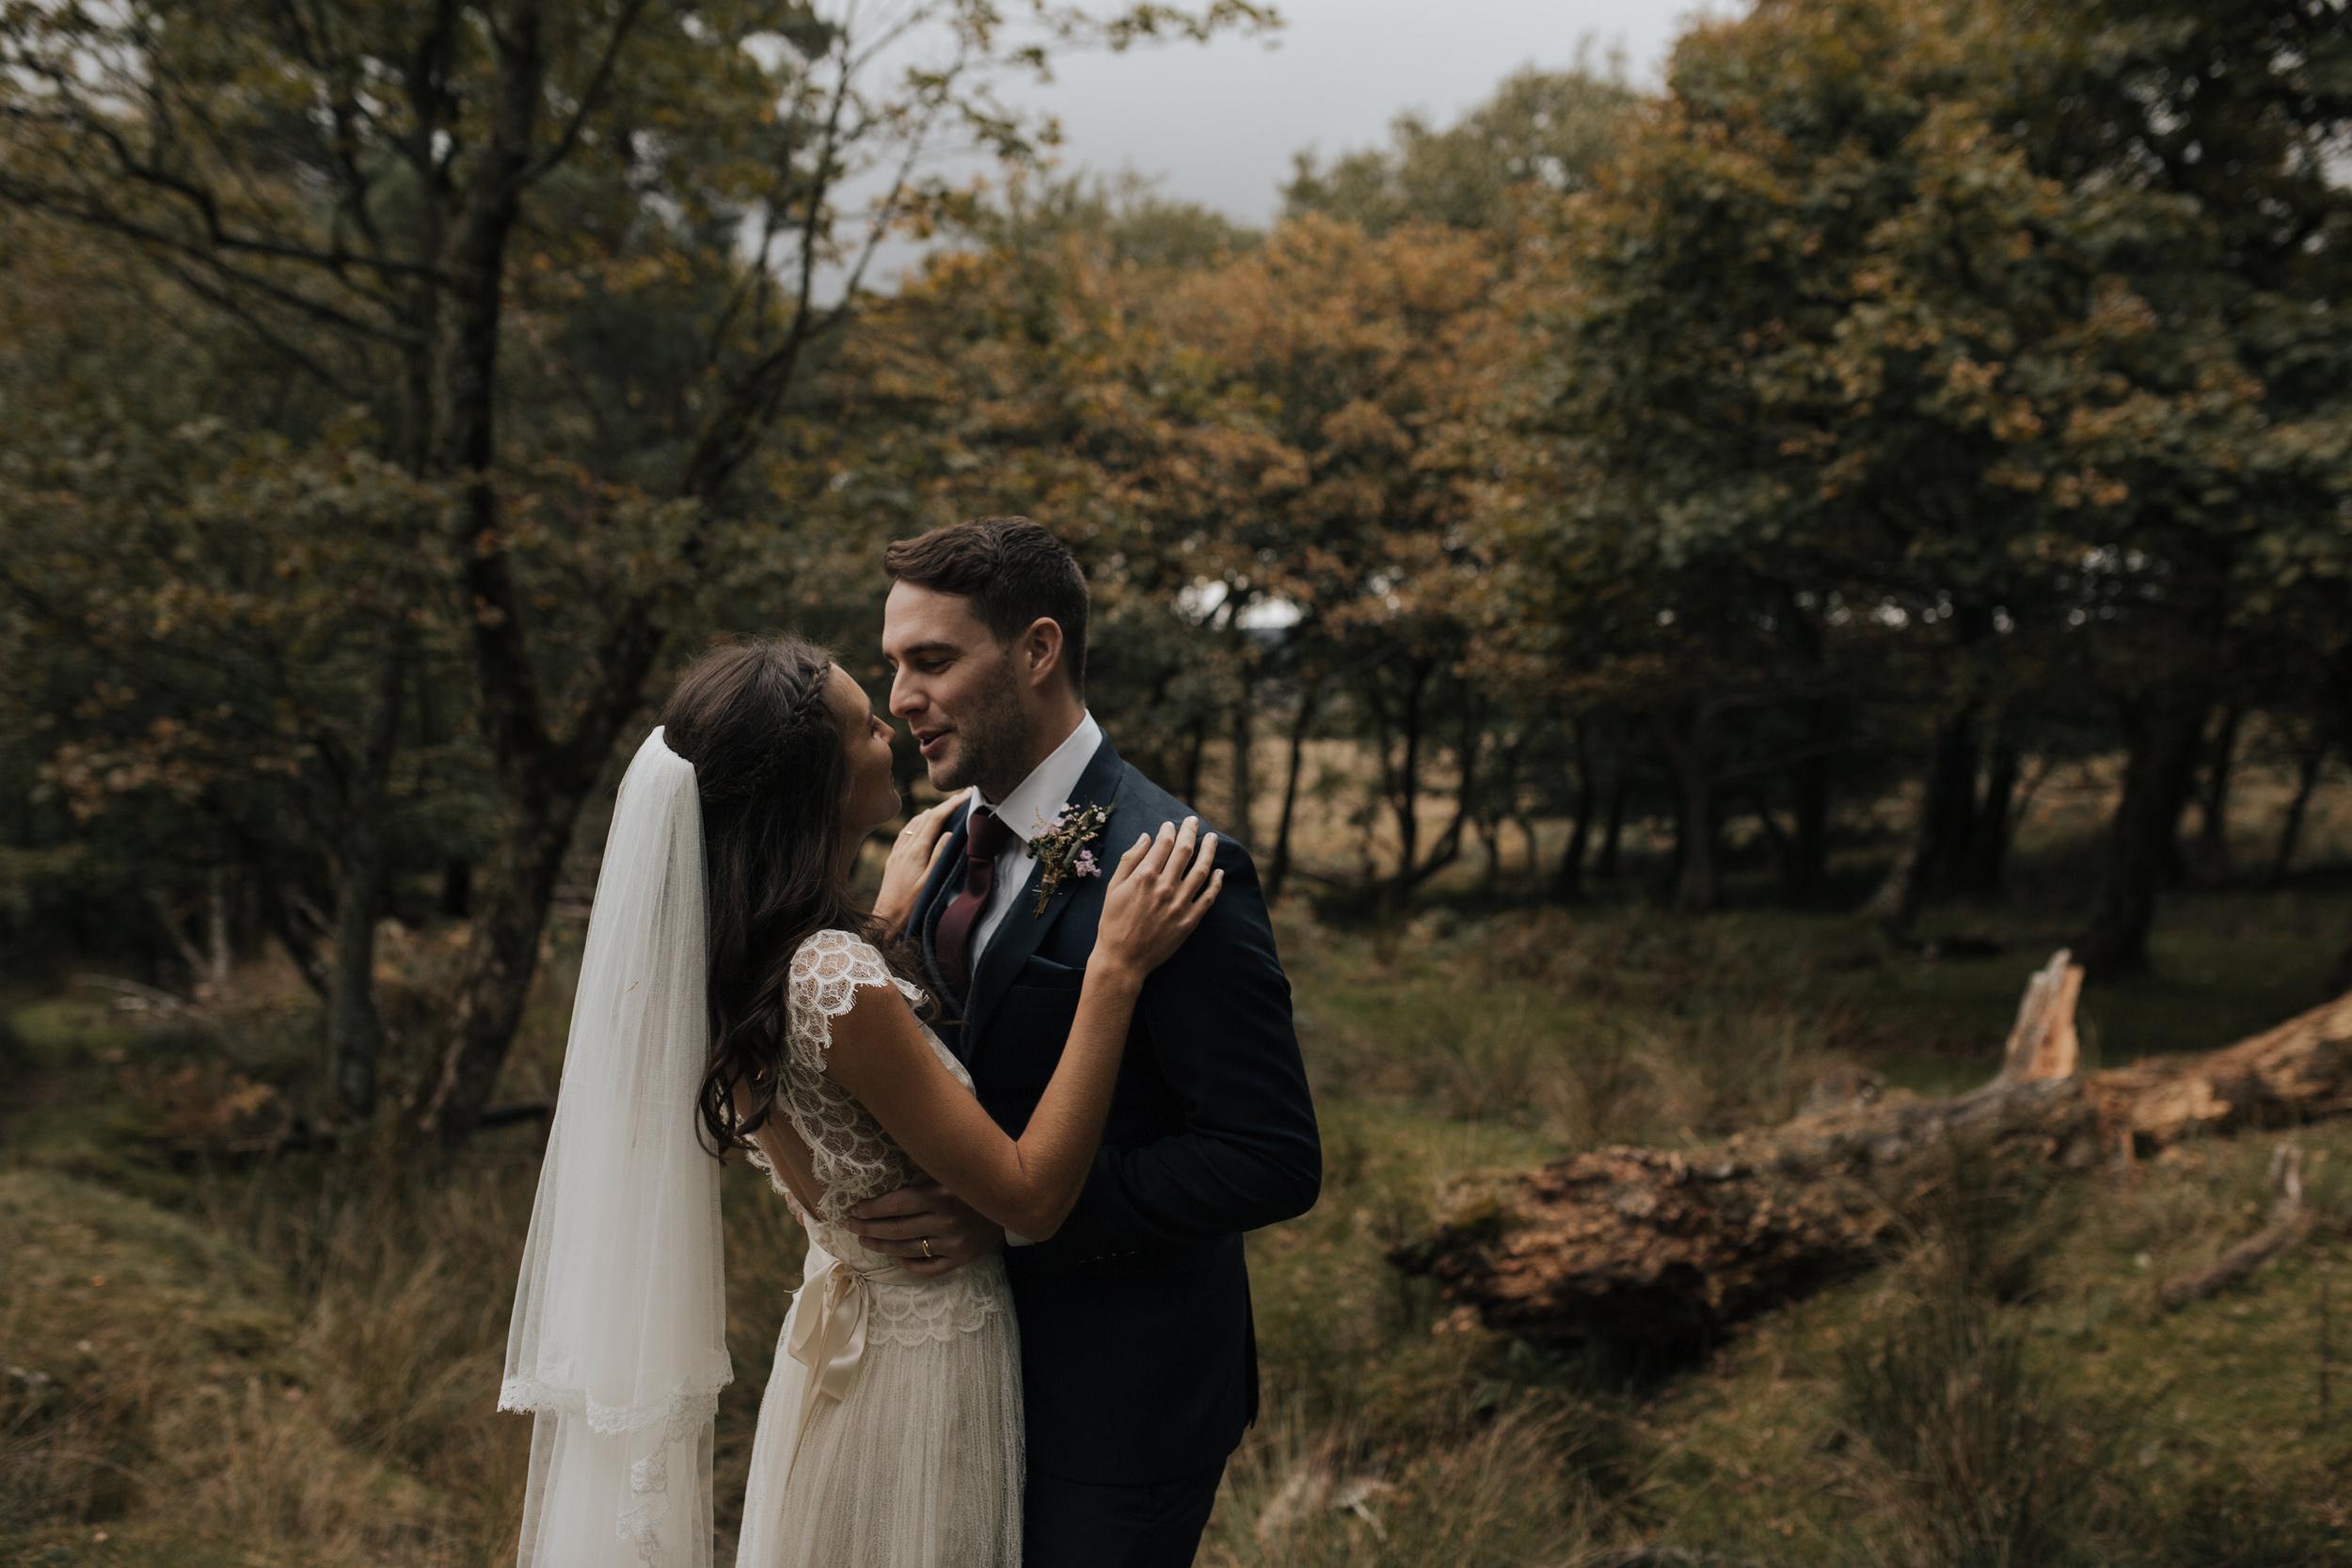 Joasia-Kate-Beaumont-Bohemian-Lace-Wedding-Dress-Peak-District-Sheffield-Wedding-29.jpg